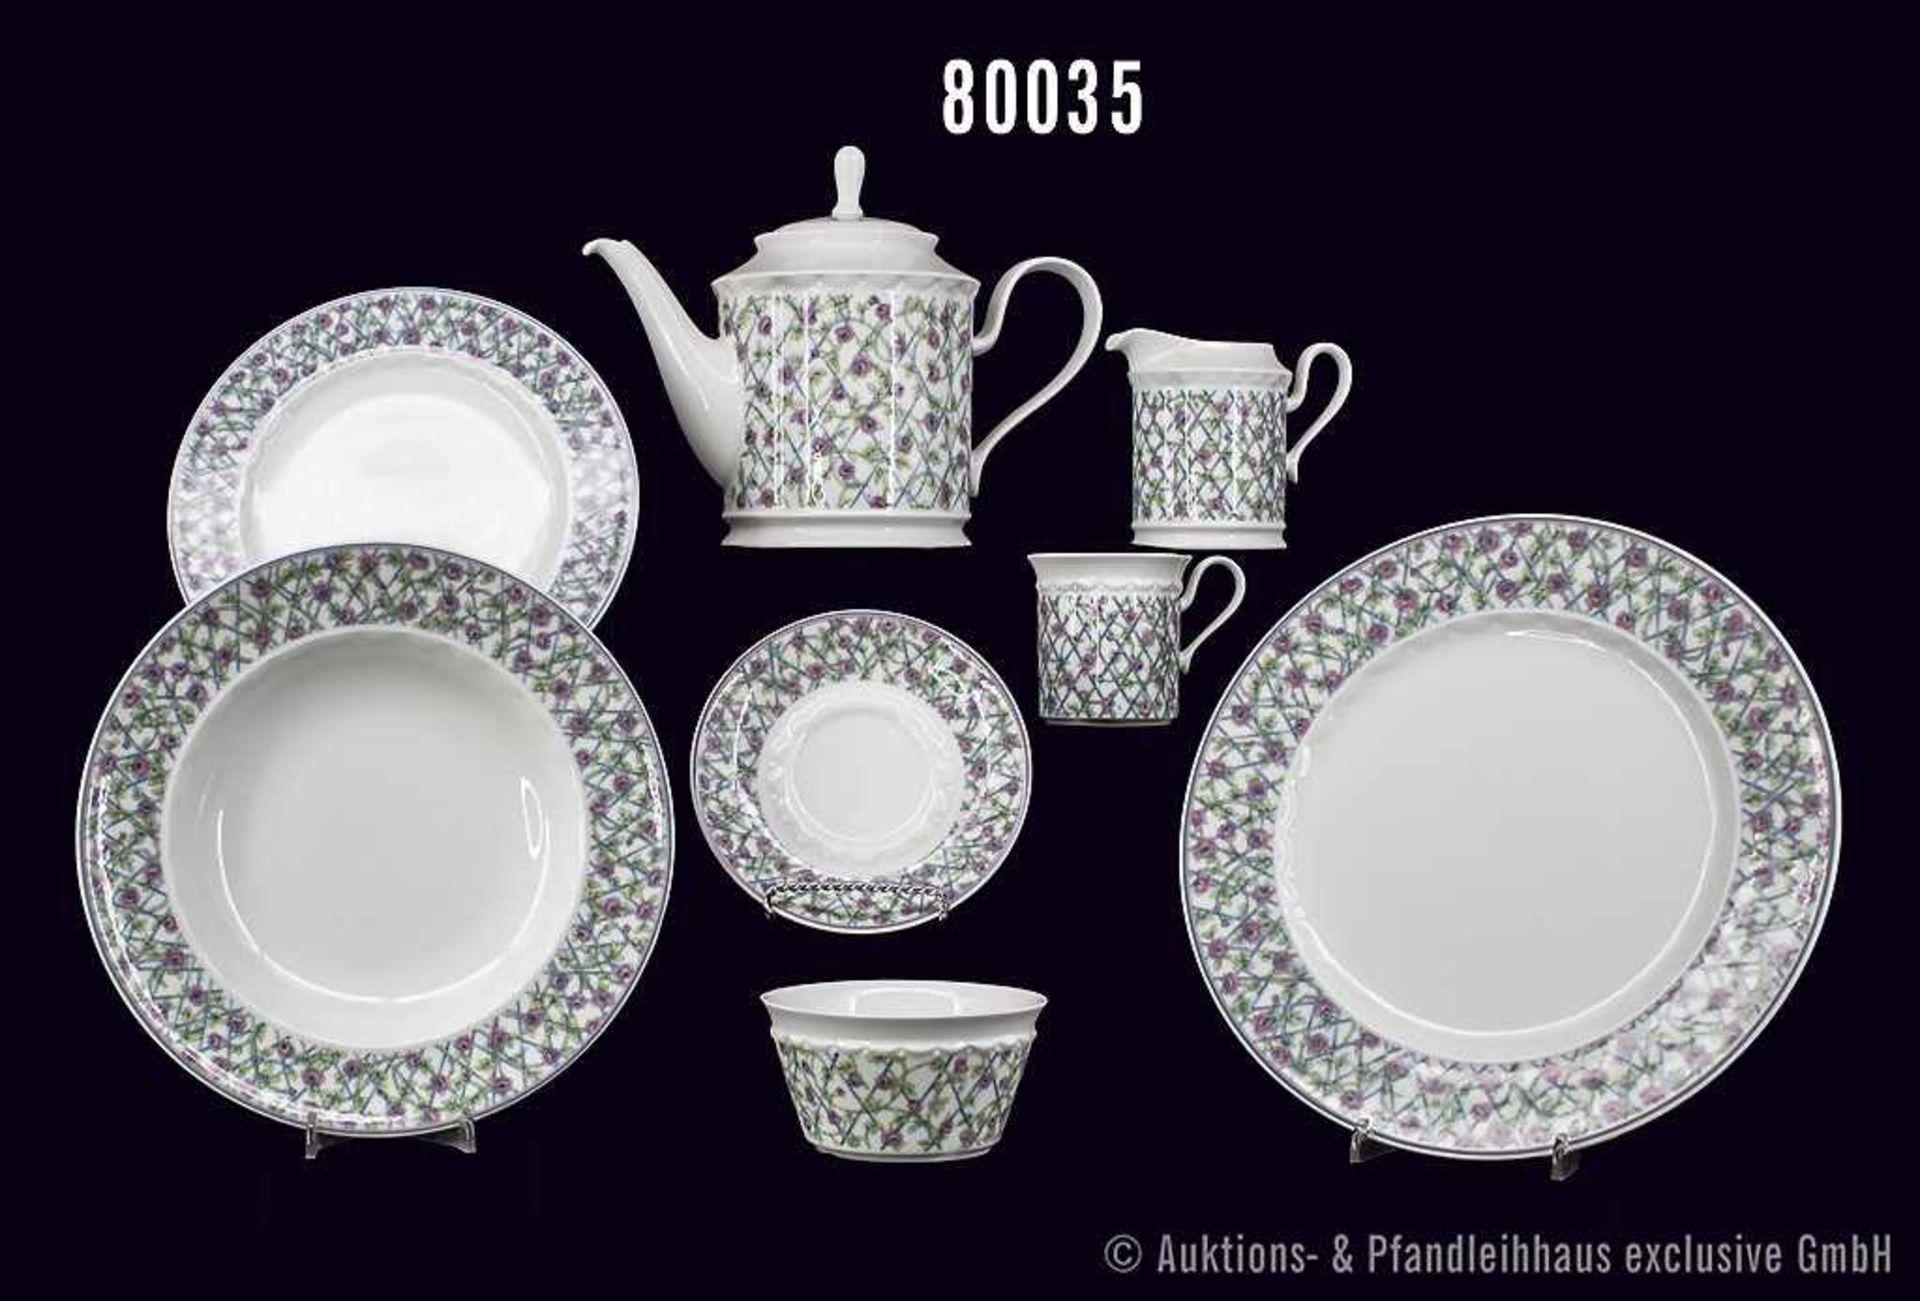 Konv. Rosenthal Porzellan, 27 Teile, Rosenthal classic, Serie Pearl China, Dekor Rosaromantika,